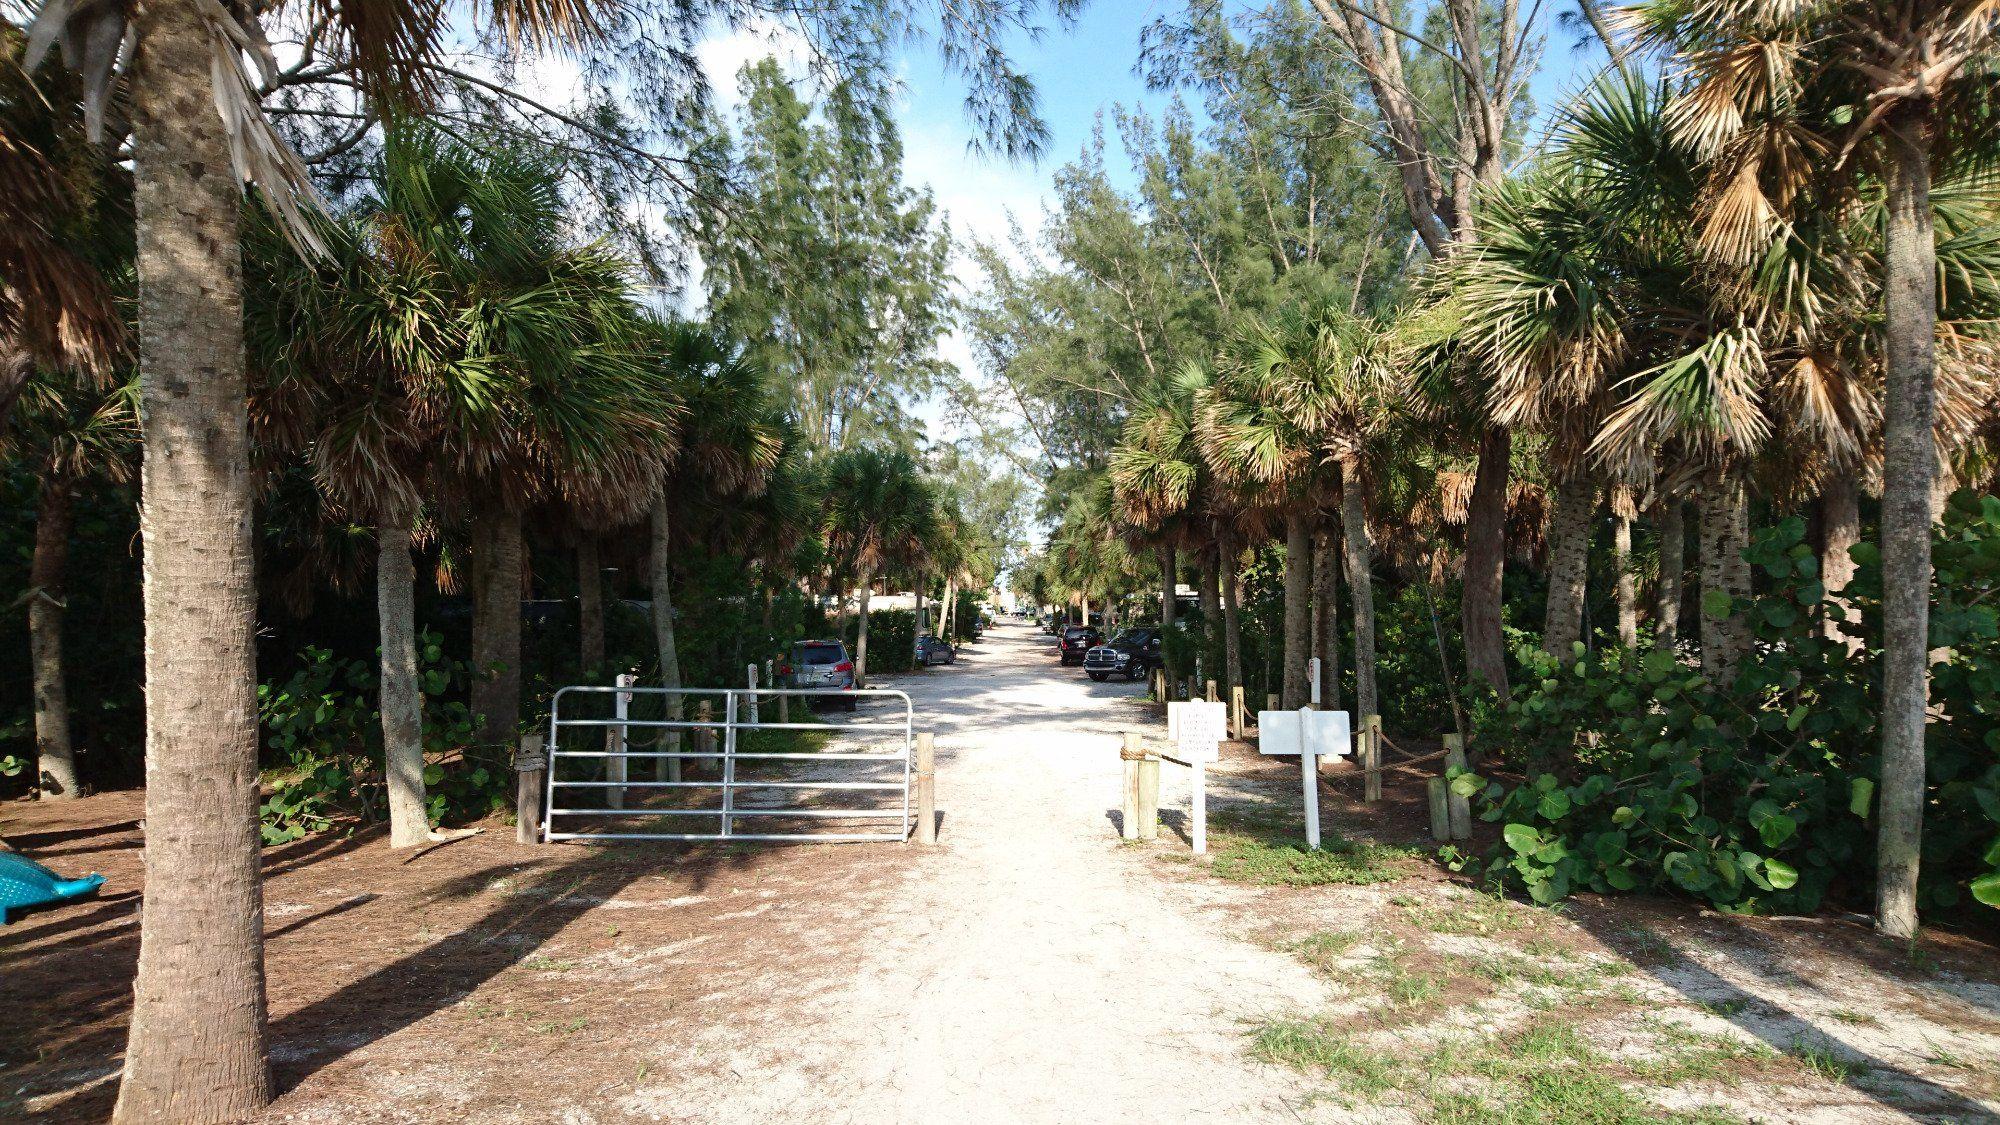 Turtle Beach Campground Sarasota Fl Trolley Runs To Downtown 2 Restaurants